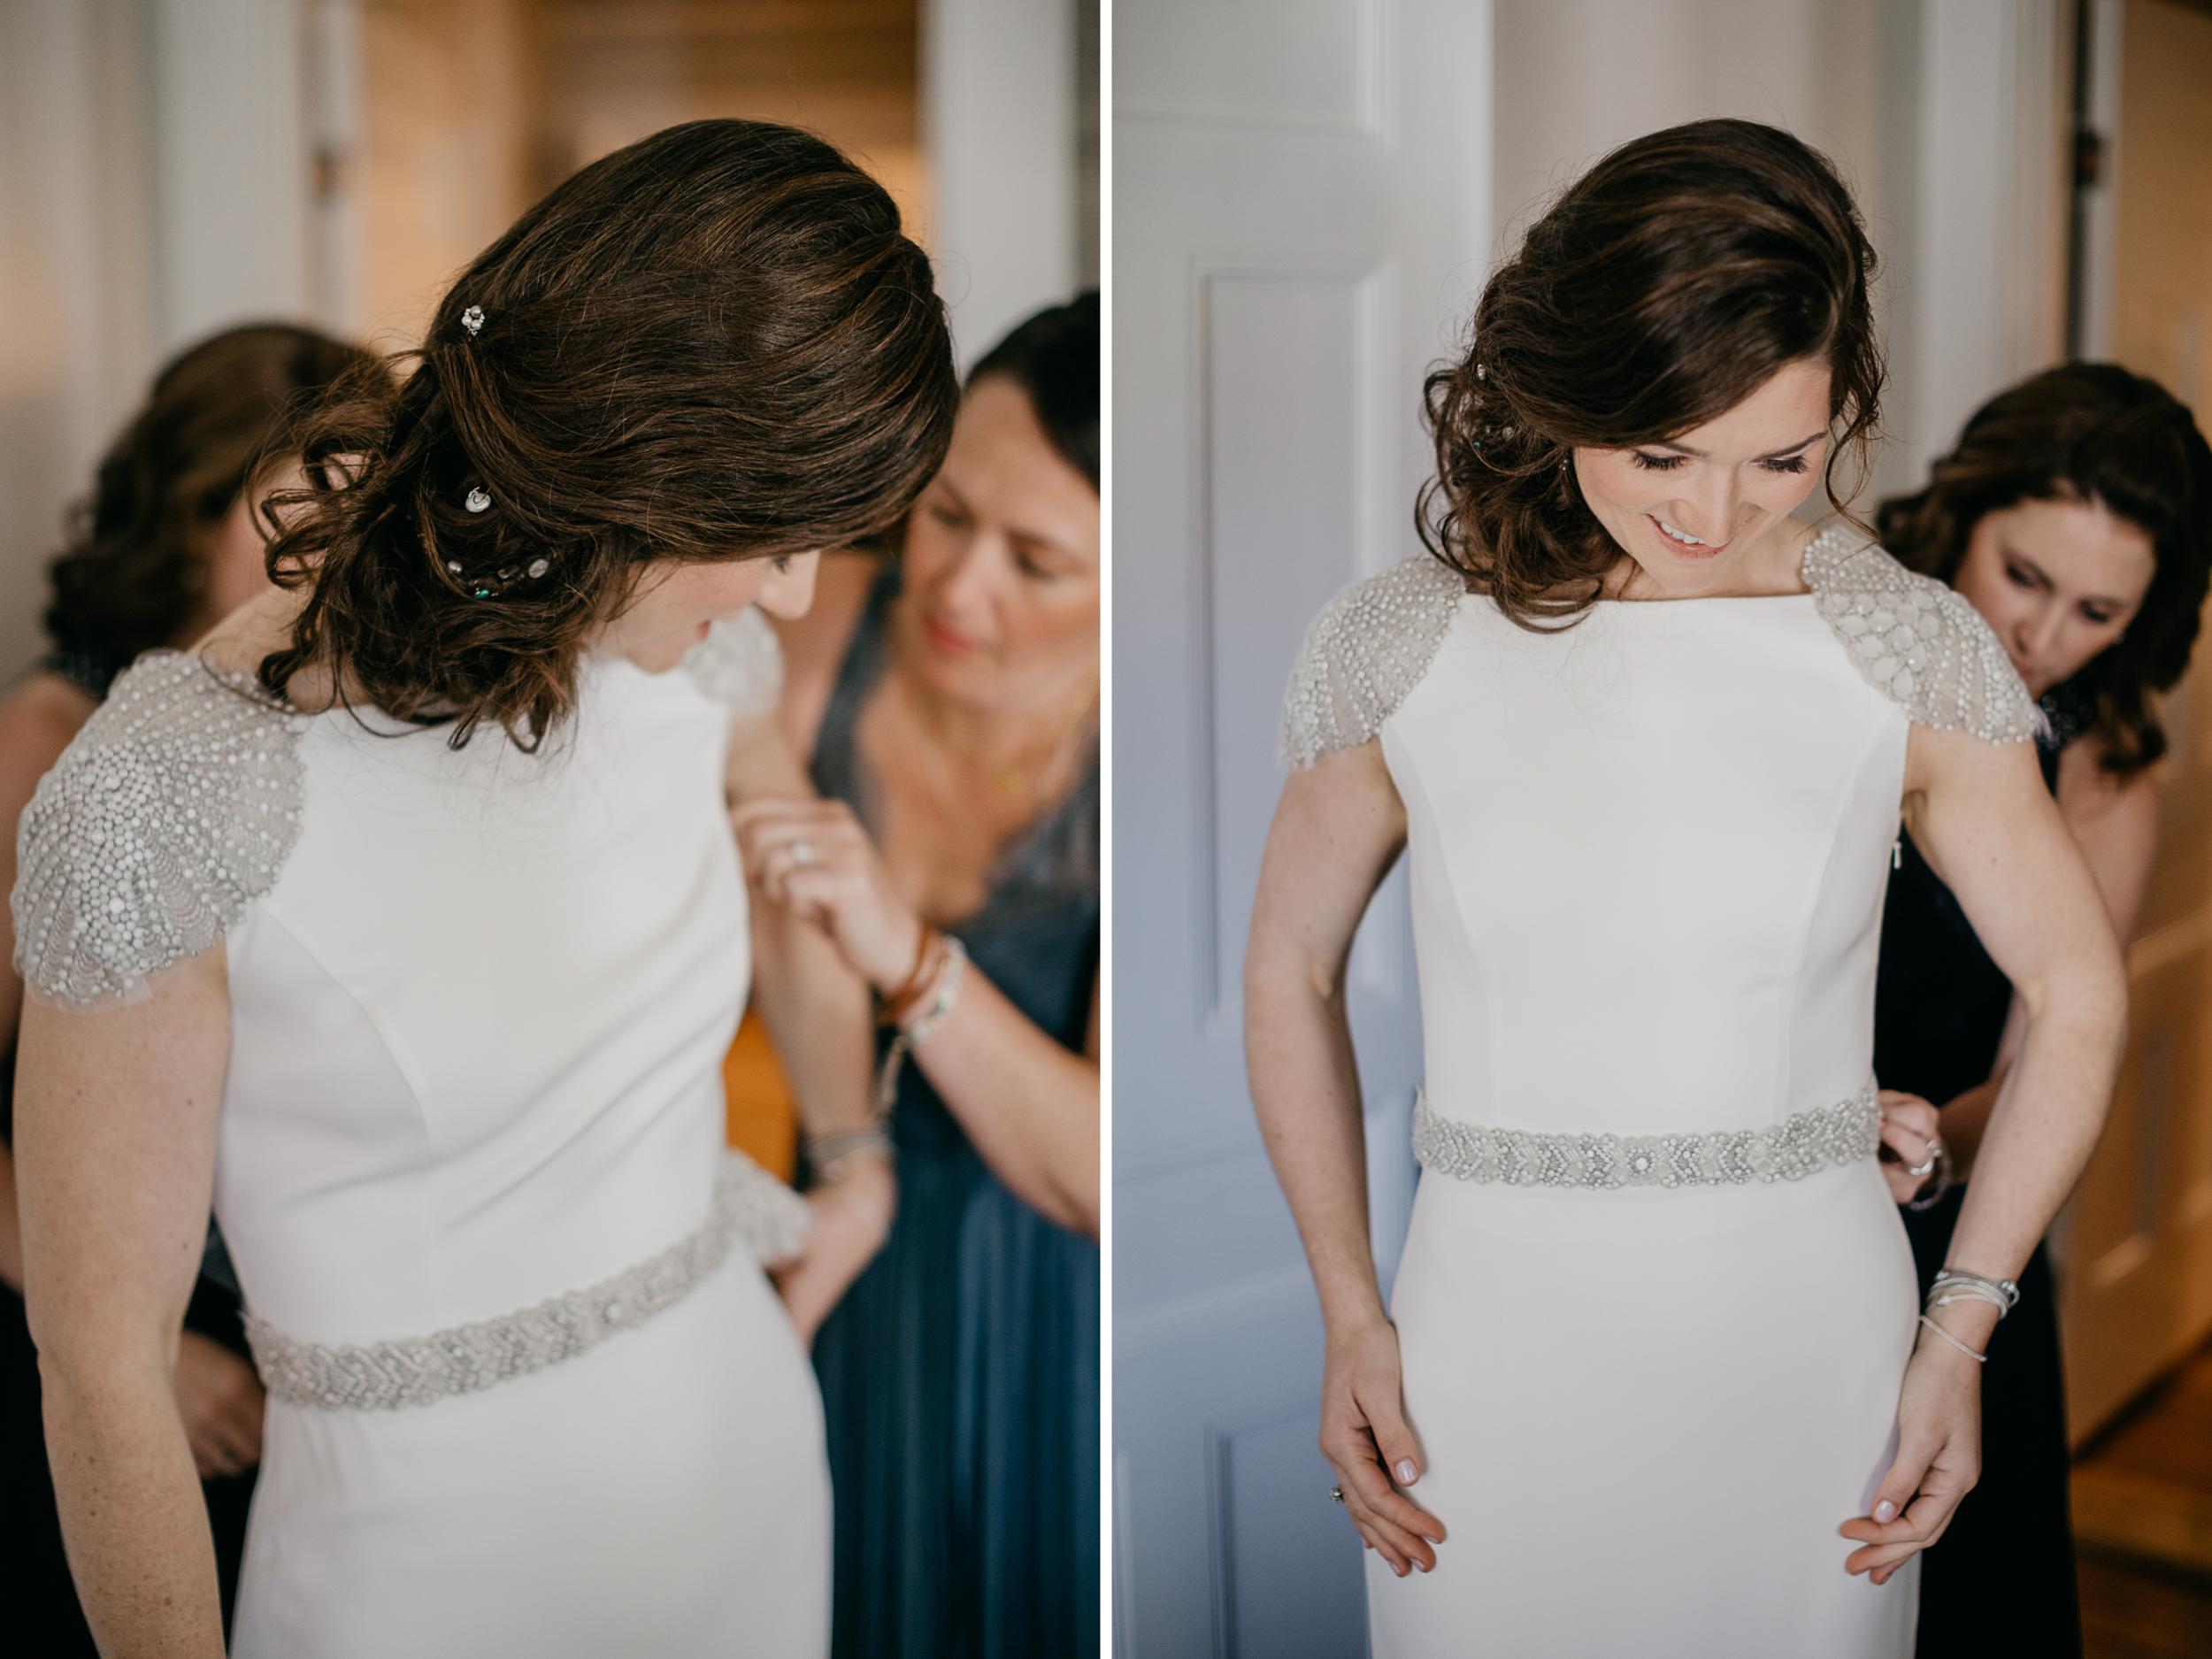 Mackenzie_Collins_Maine_wedding_in_Rockport_Union_hall_Nina_June_007.jpg